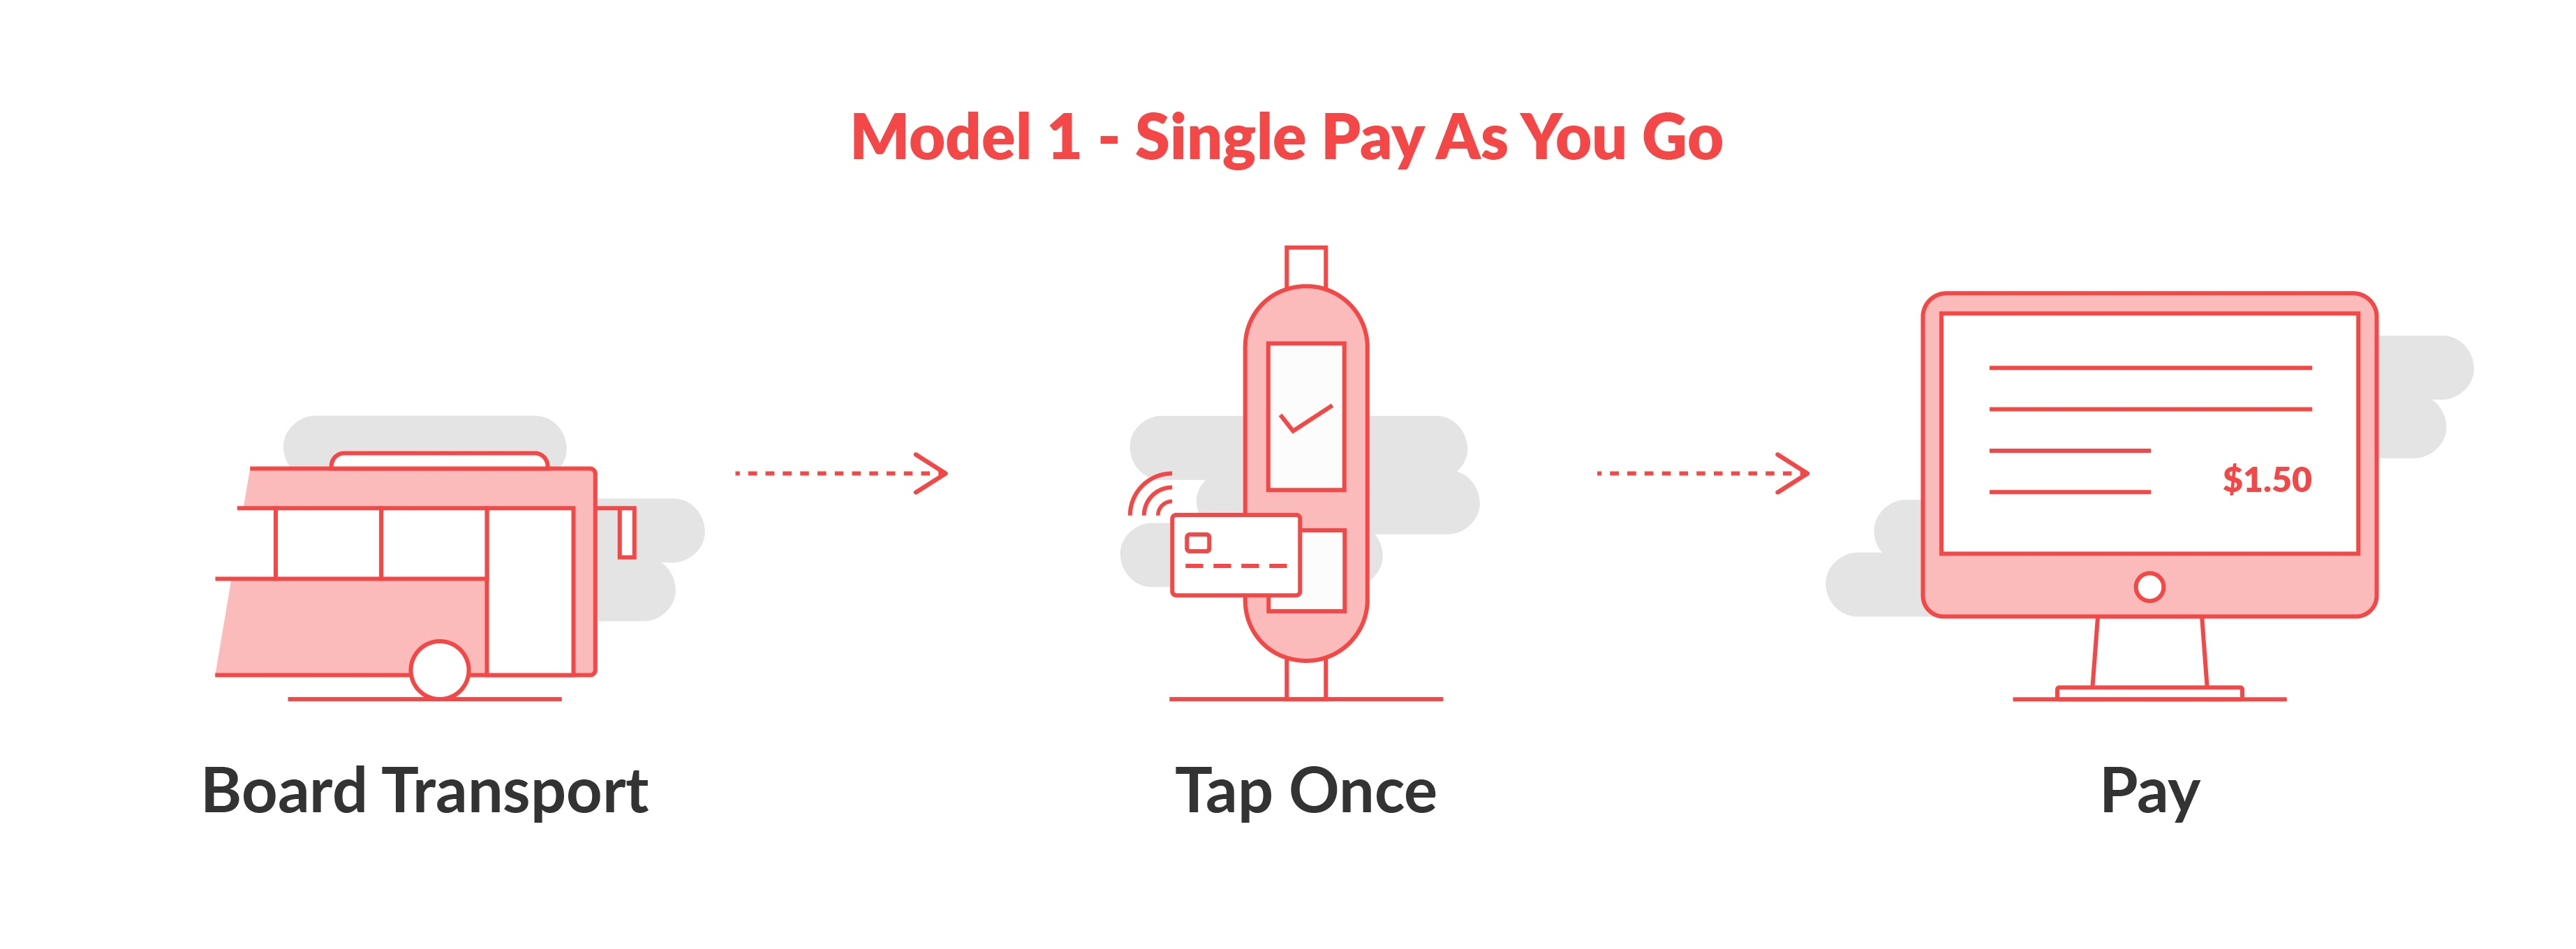 model-1-single-pay-as-you-go